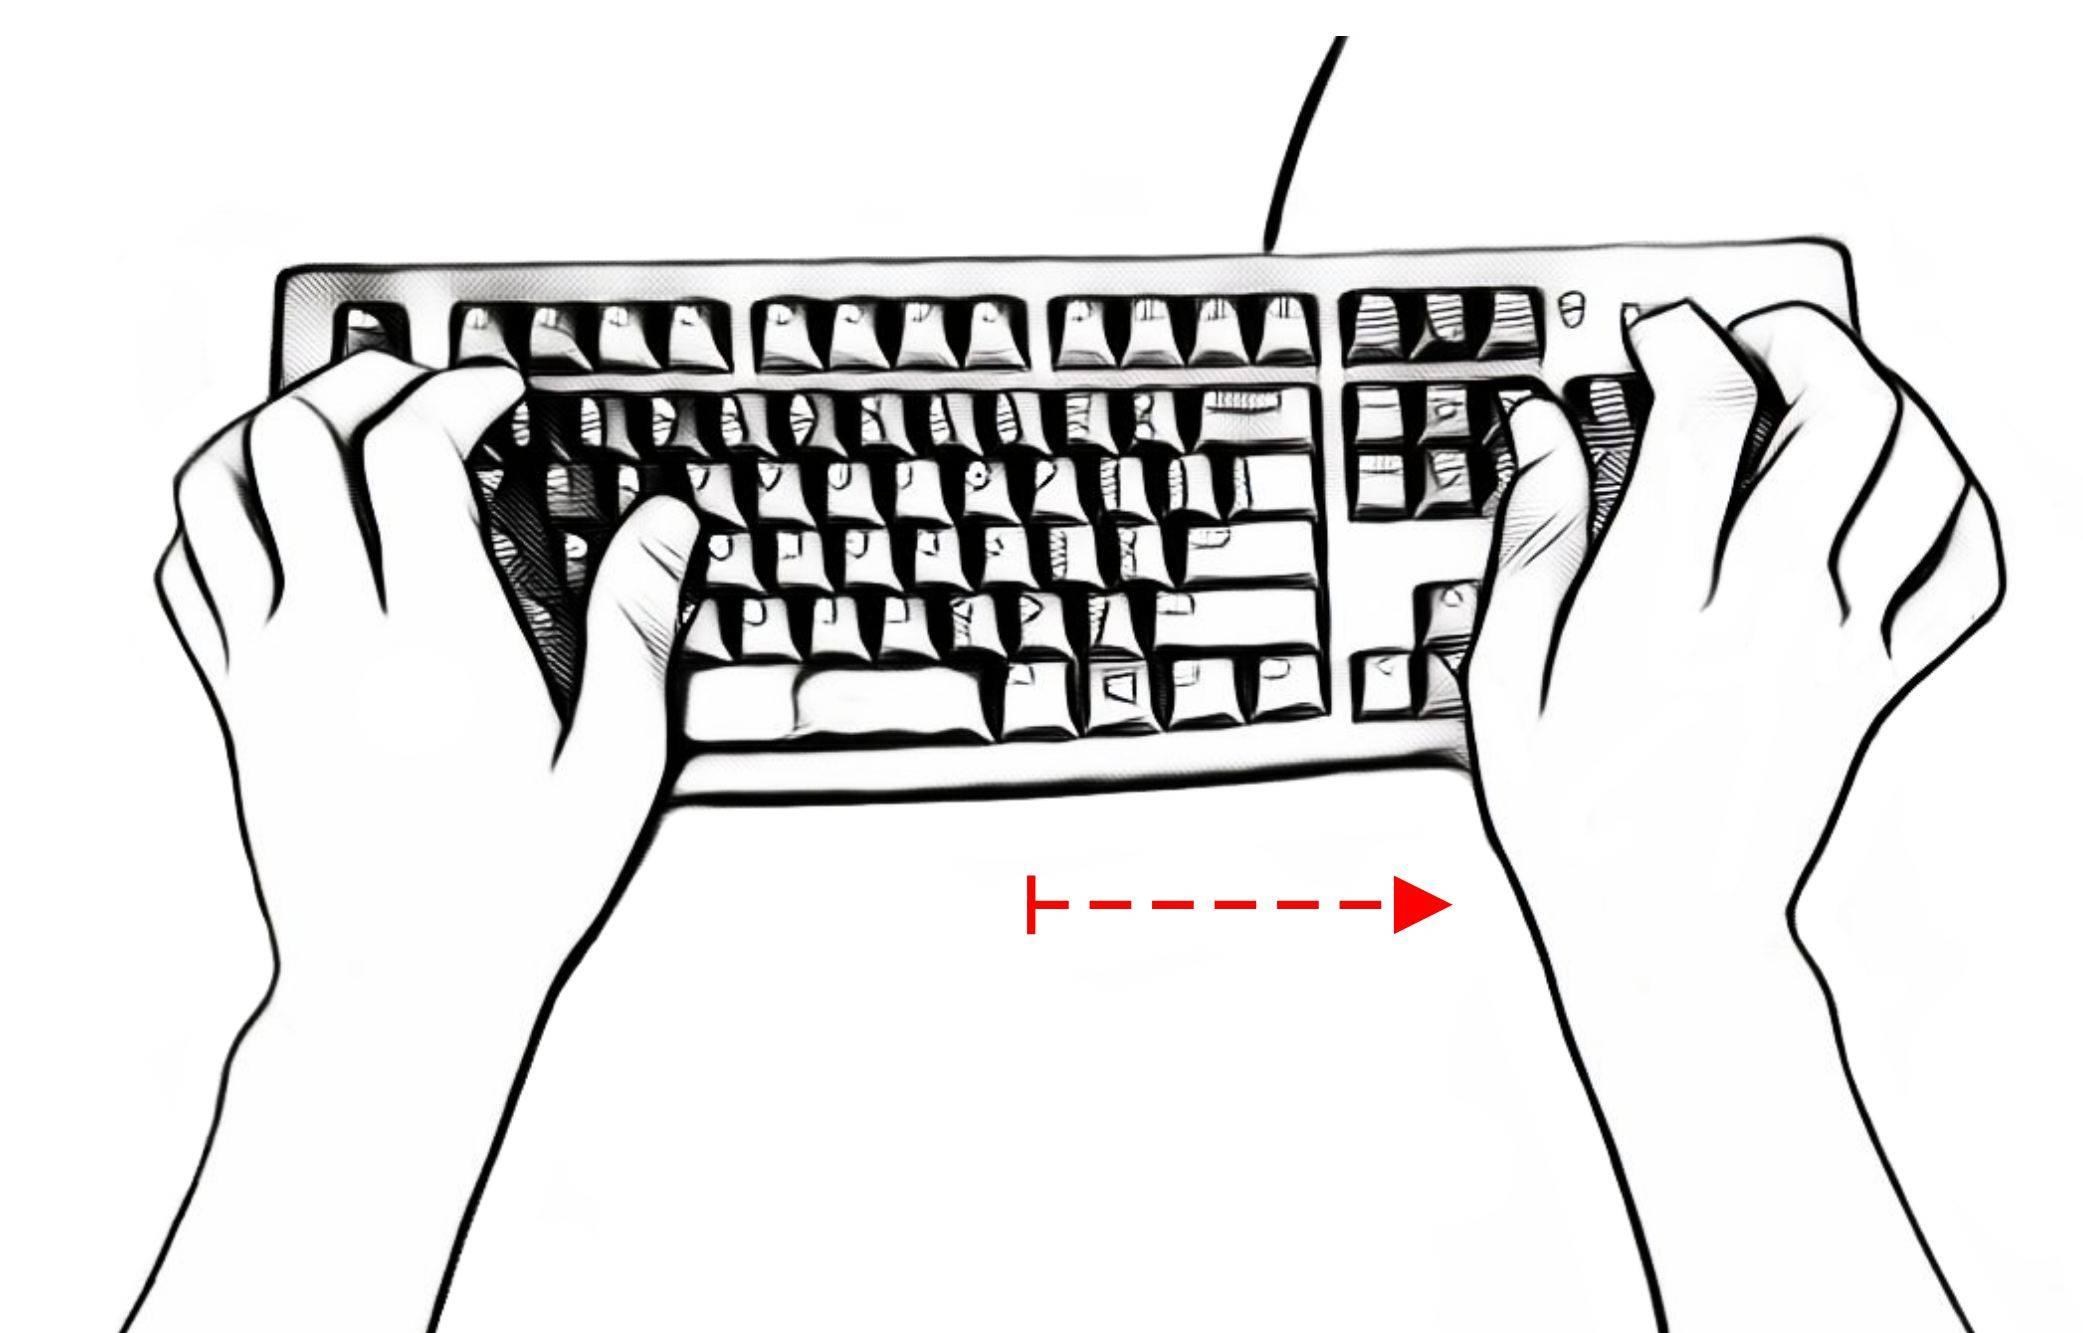 standard keyboard numpad